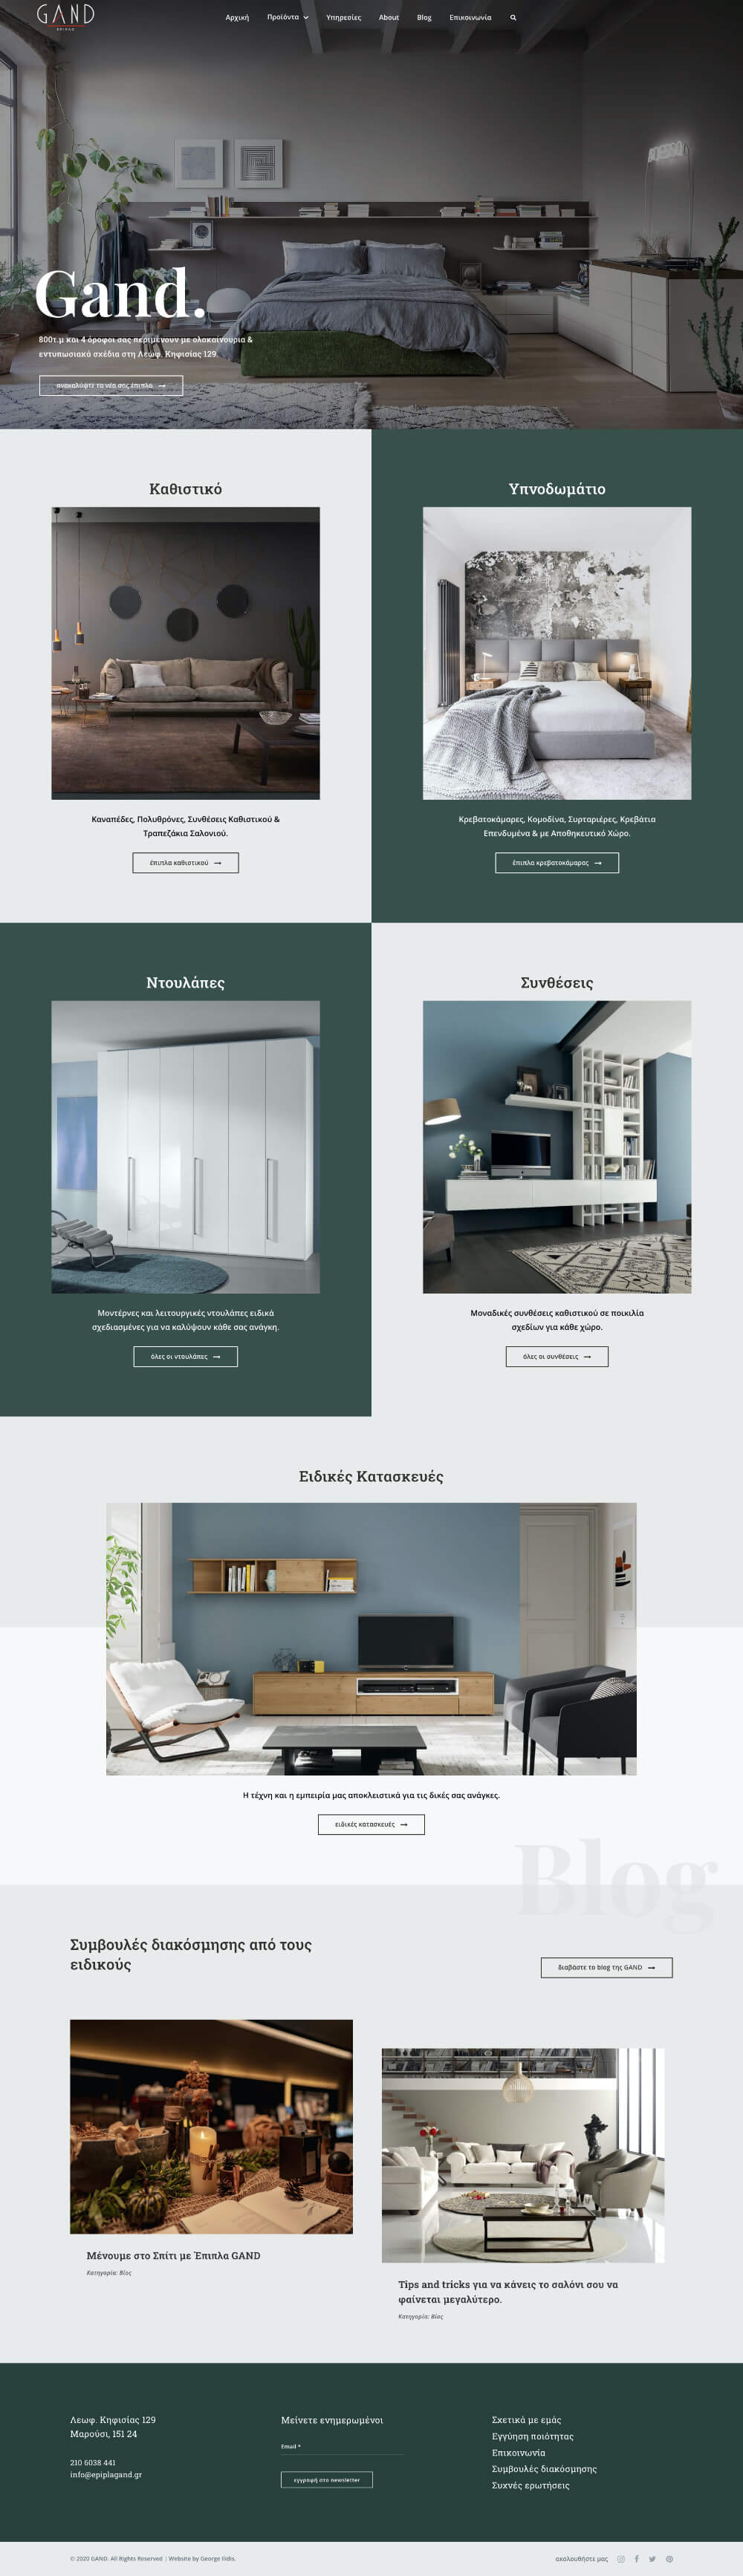 WordPress Website Design & Development - Home Page - GAND Furniture